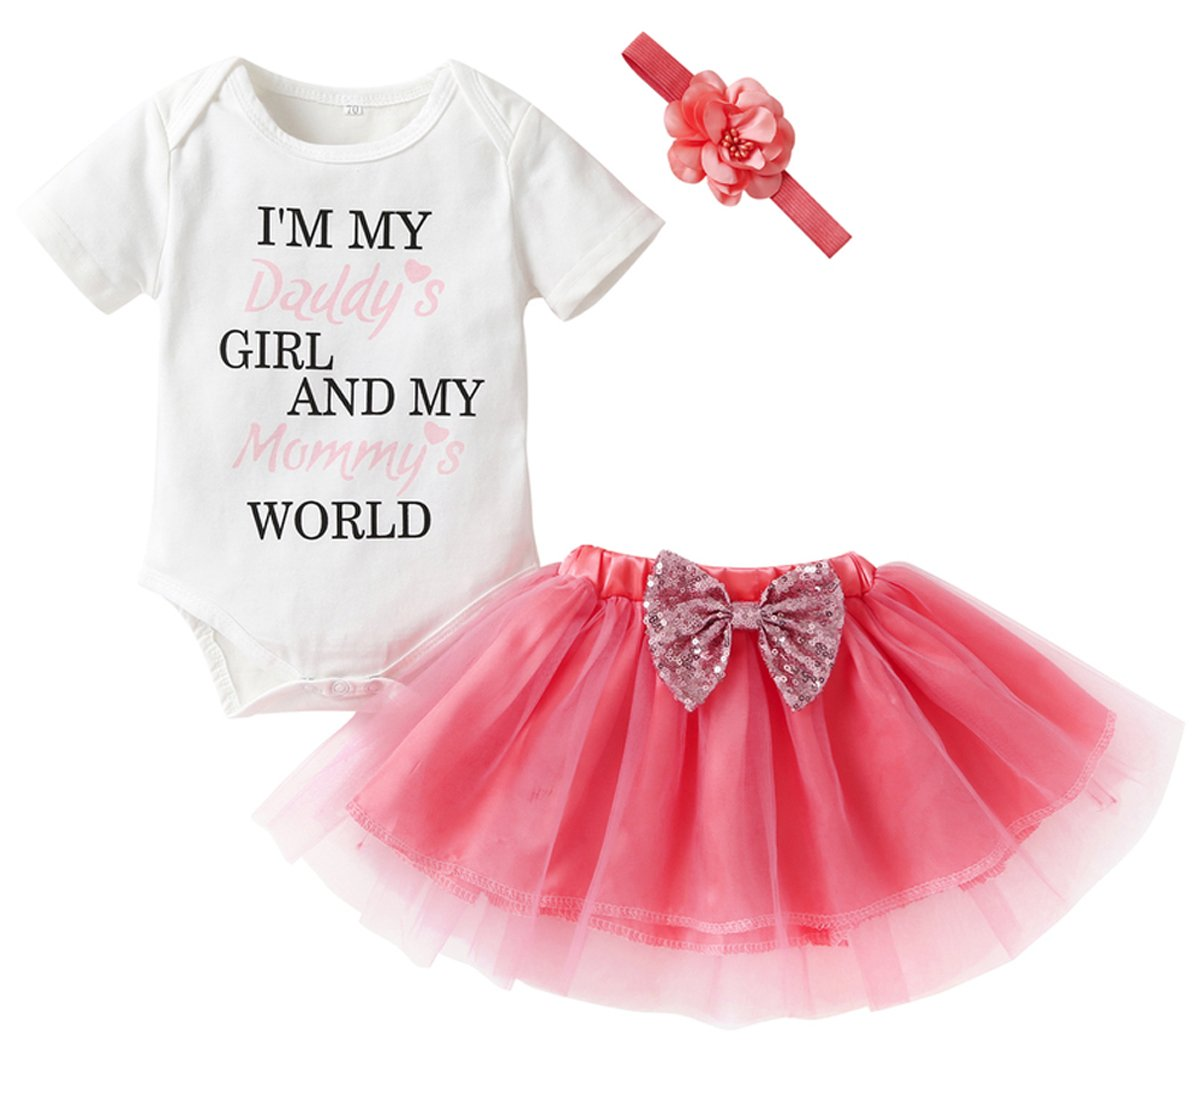 HappyMA Newborn Infant Kids Baby Girls Outfits Set Letter Romper Tops+Tutu Skirt+Headband (0-3 Months)